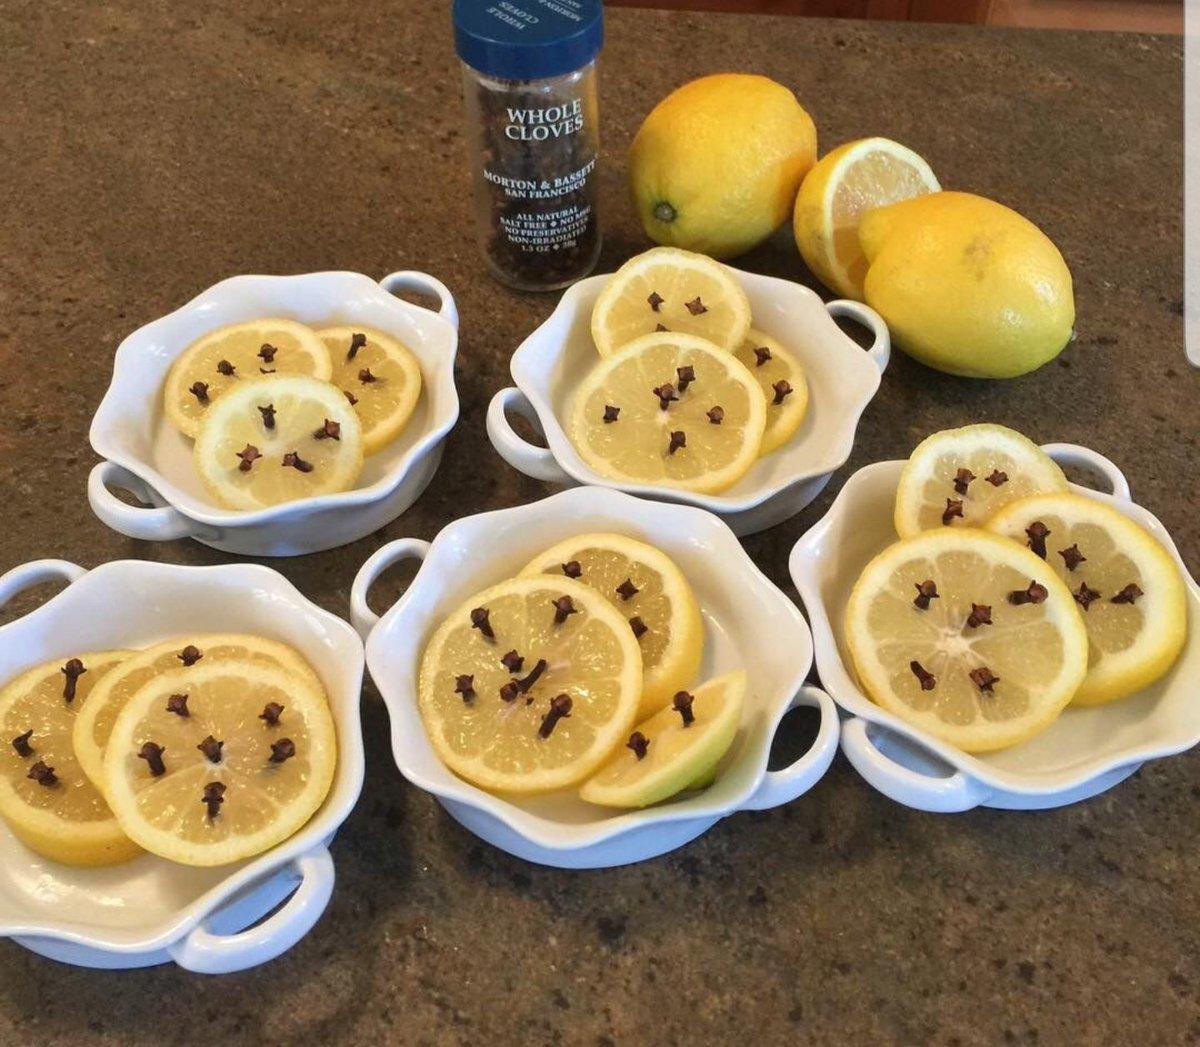 Cloves in a lemon slice will keep yellow jackets away.#thenine@fox2